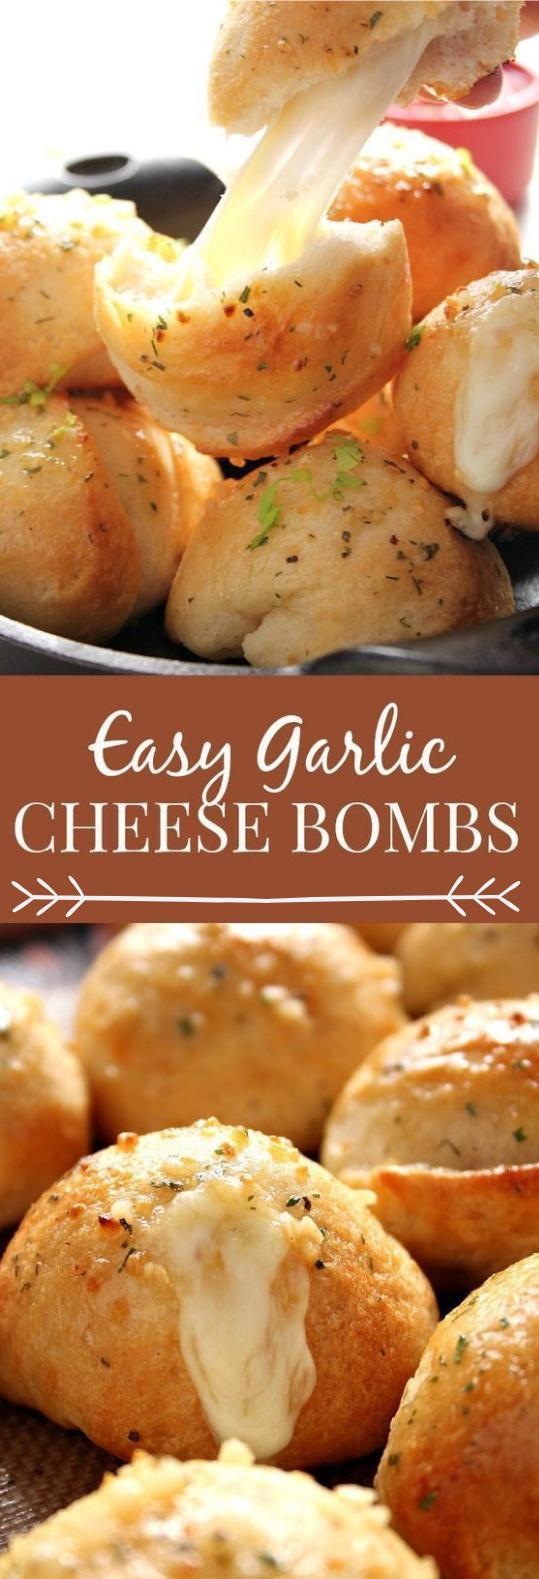 Easy Garlic Cheese Bombs Recipe #garlic #vegetarian